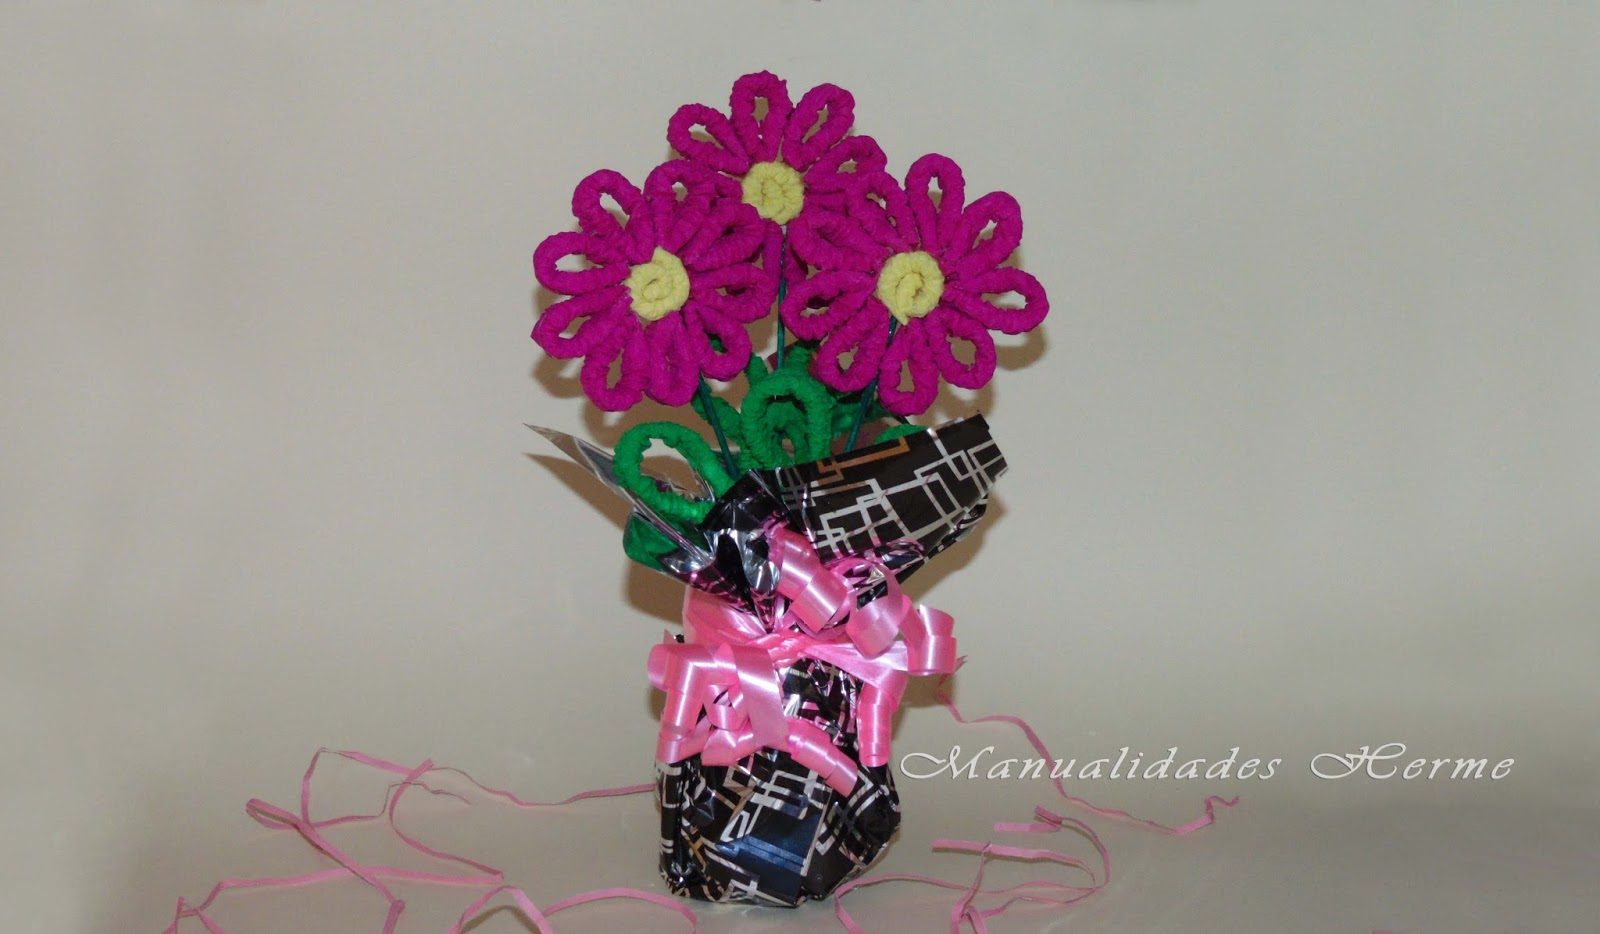 Manualidades Herme Hacer Flores De Papel Crepe - Hacer-flores-con-papel